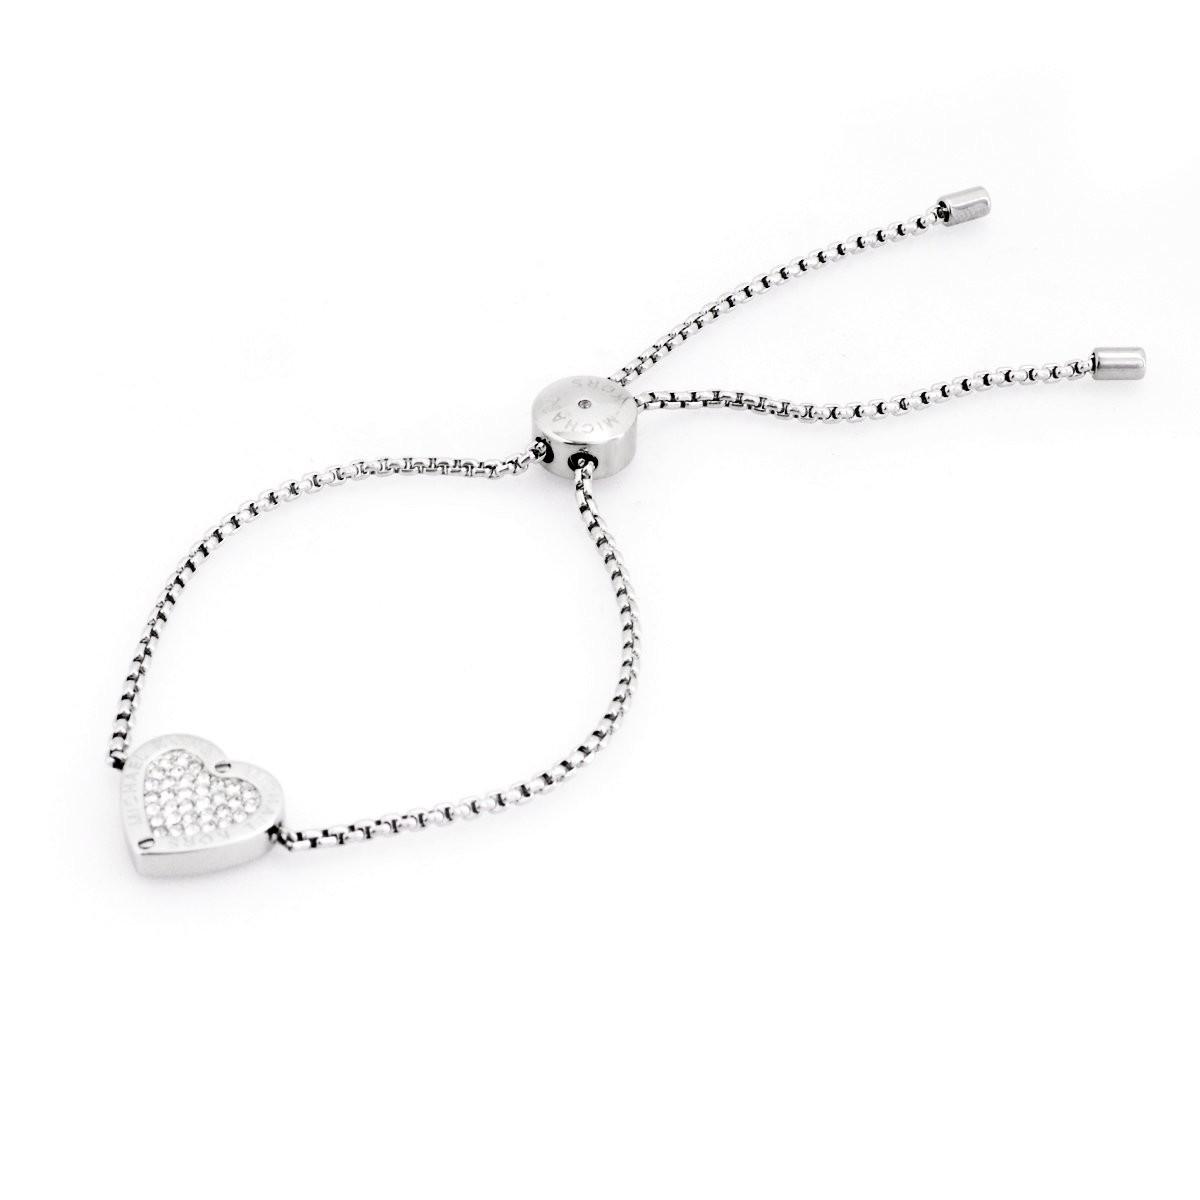 cedc42649209 マイケルコース MICHAEL KORS MKJ4141040 Pave Silver-Tone Heart Charm Slider  Bracelet パヴェ ハートチャーム